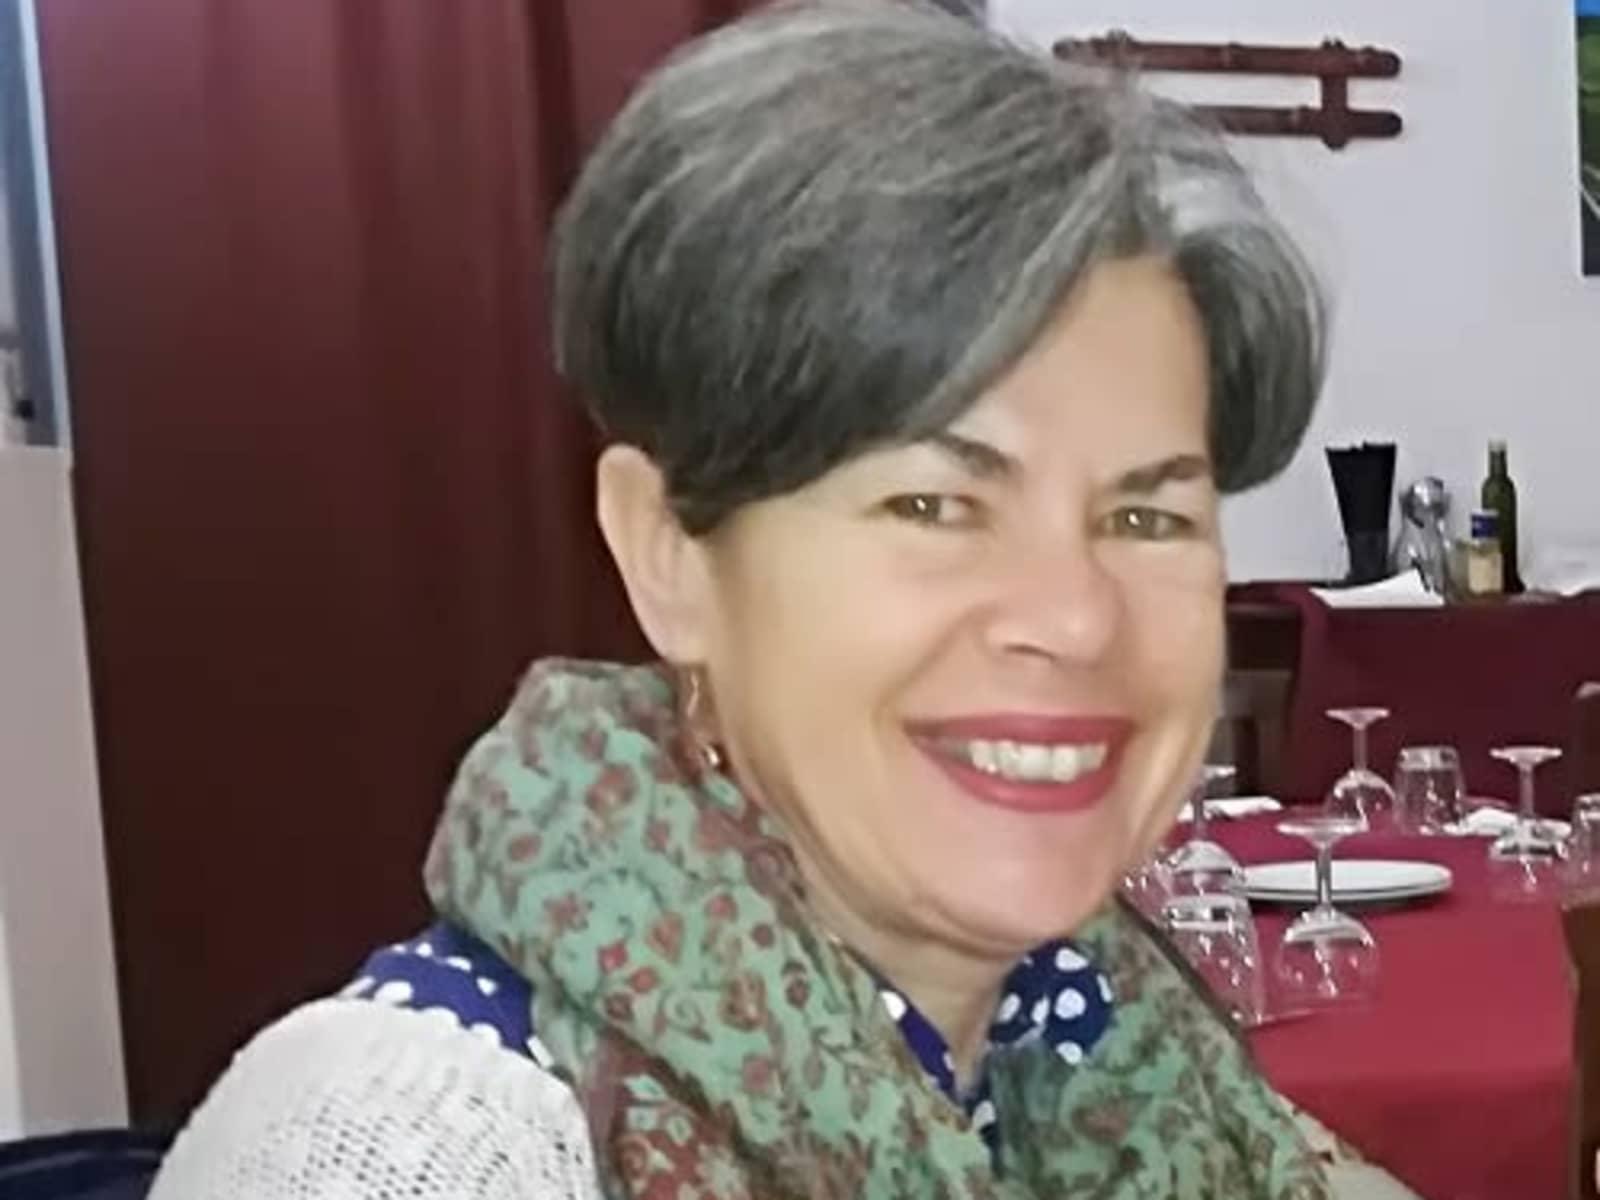 Kathy from Hobart, Tasmania, Australia